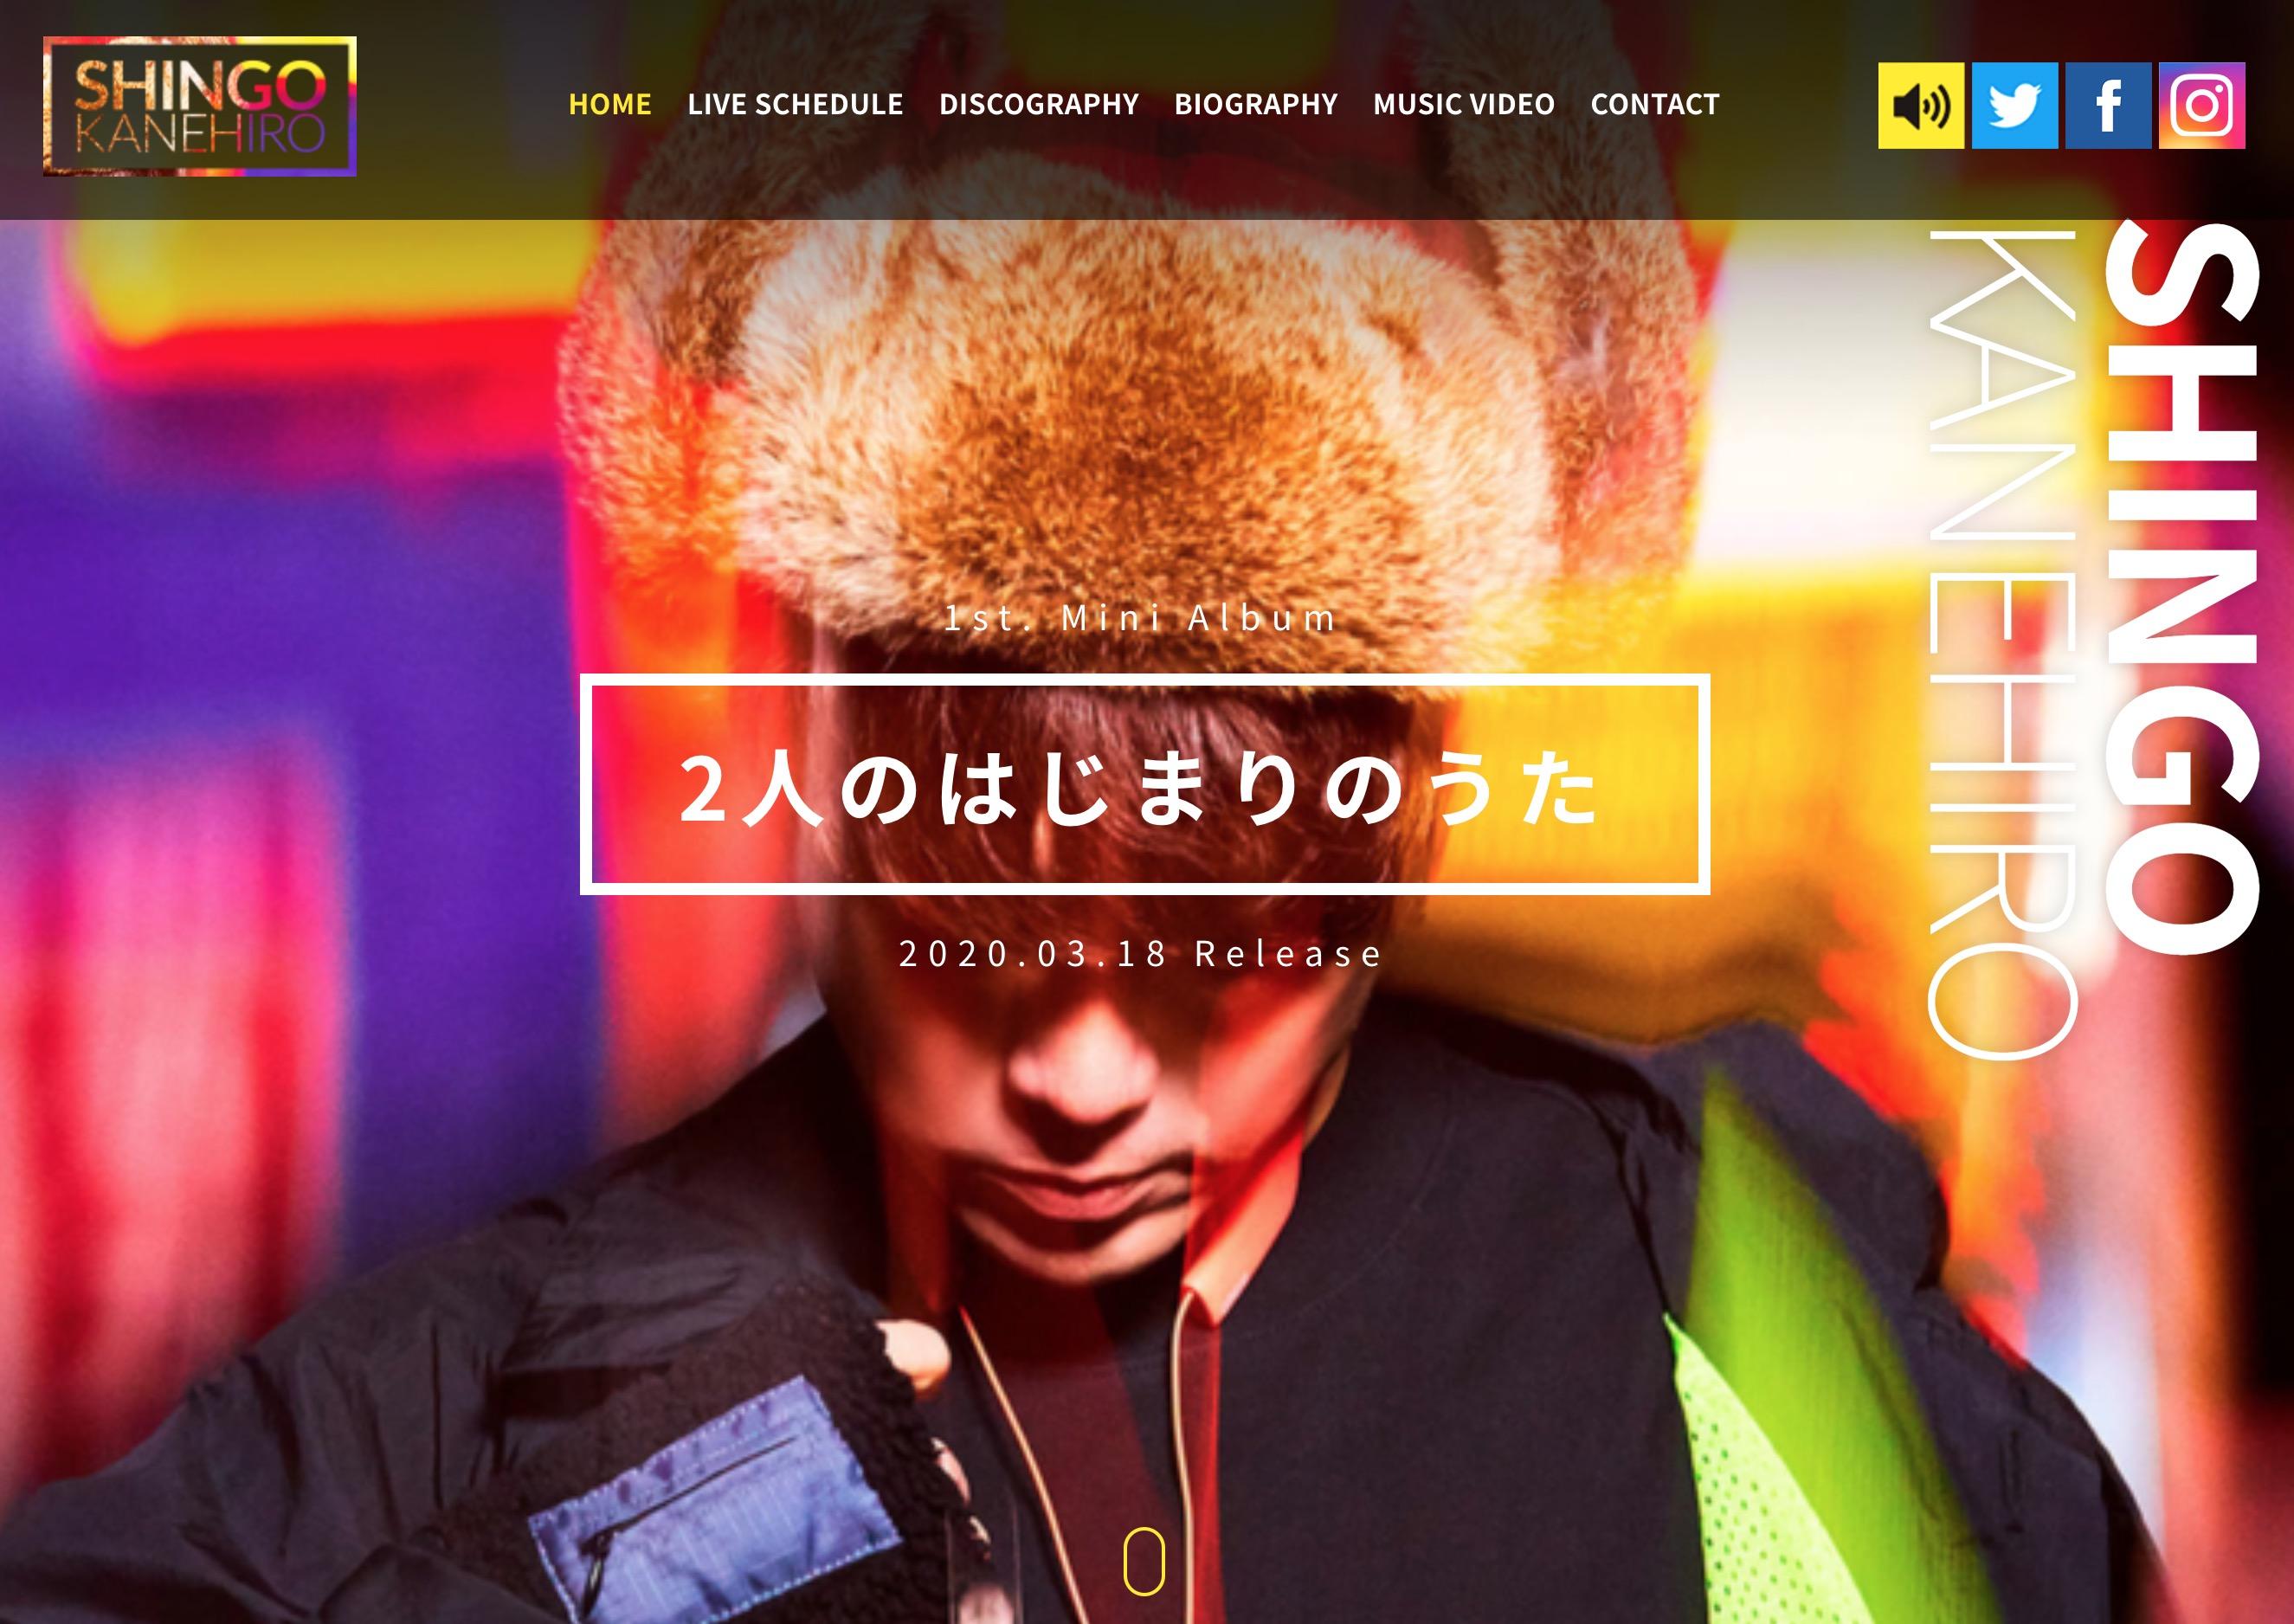 Shingo Kanehiro Official Website